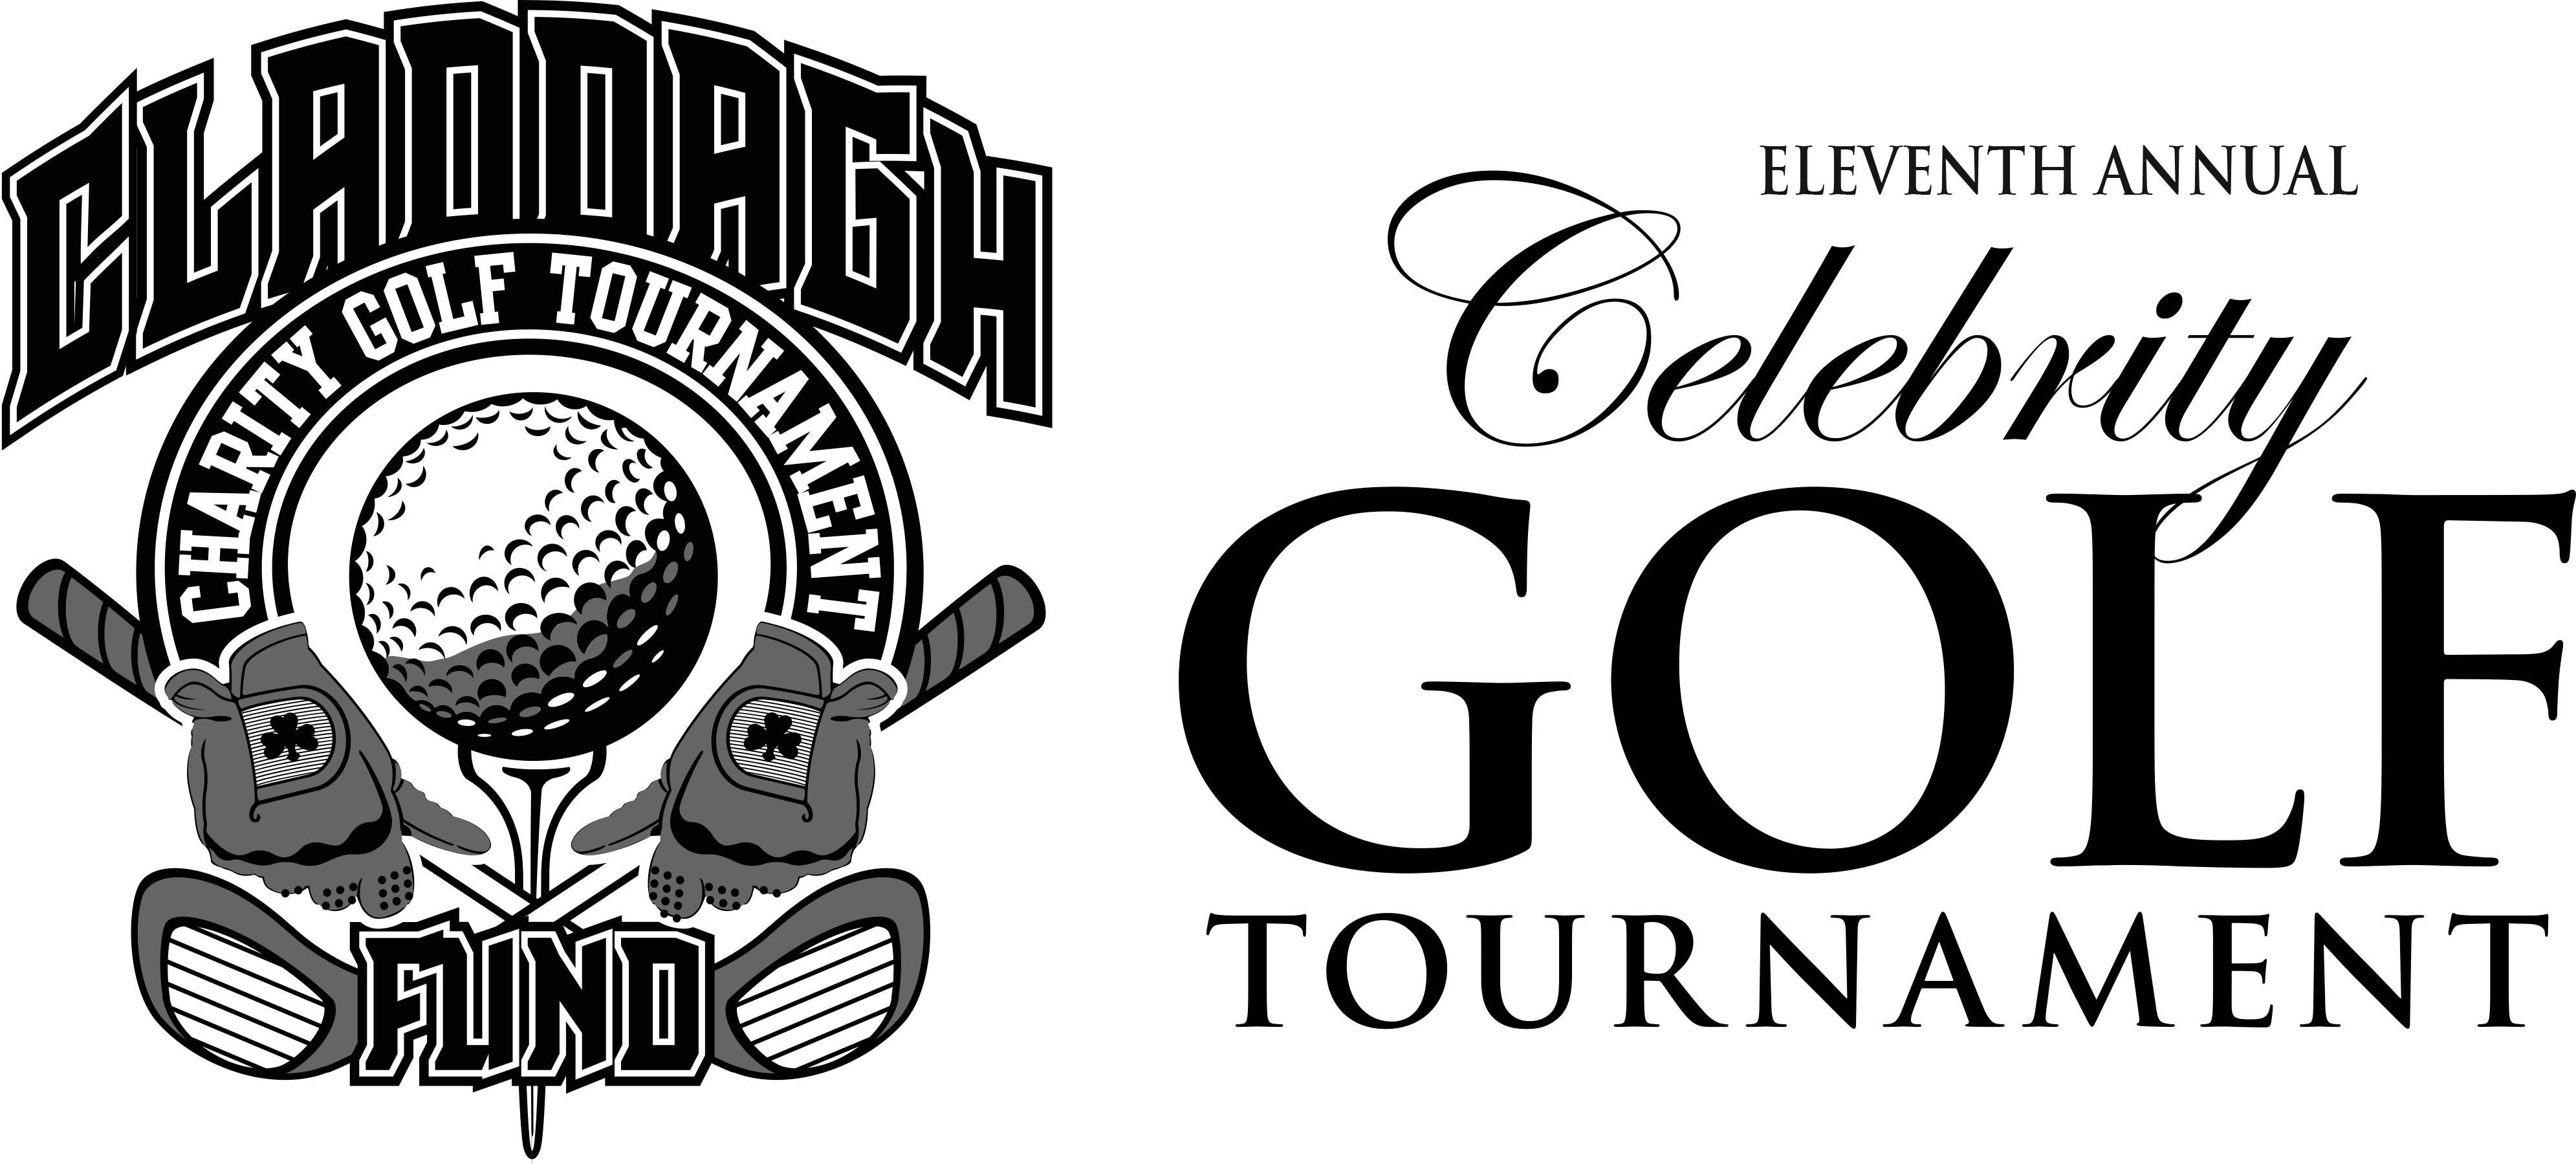 11th Annual Celebrity Golf Tournament